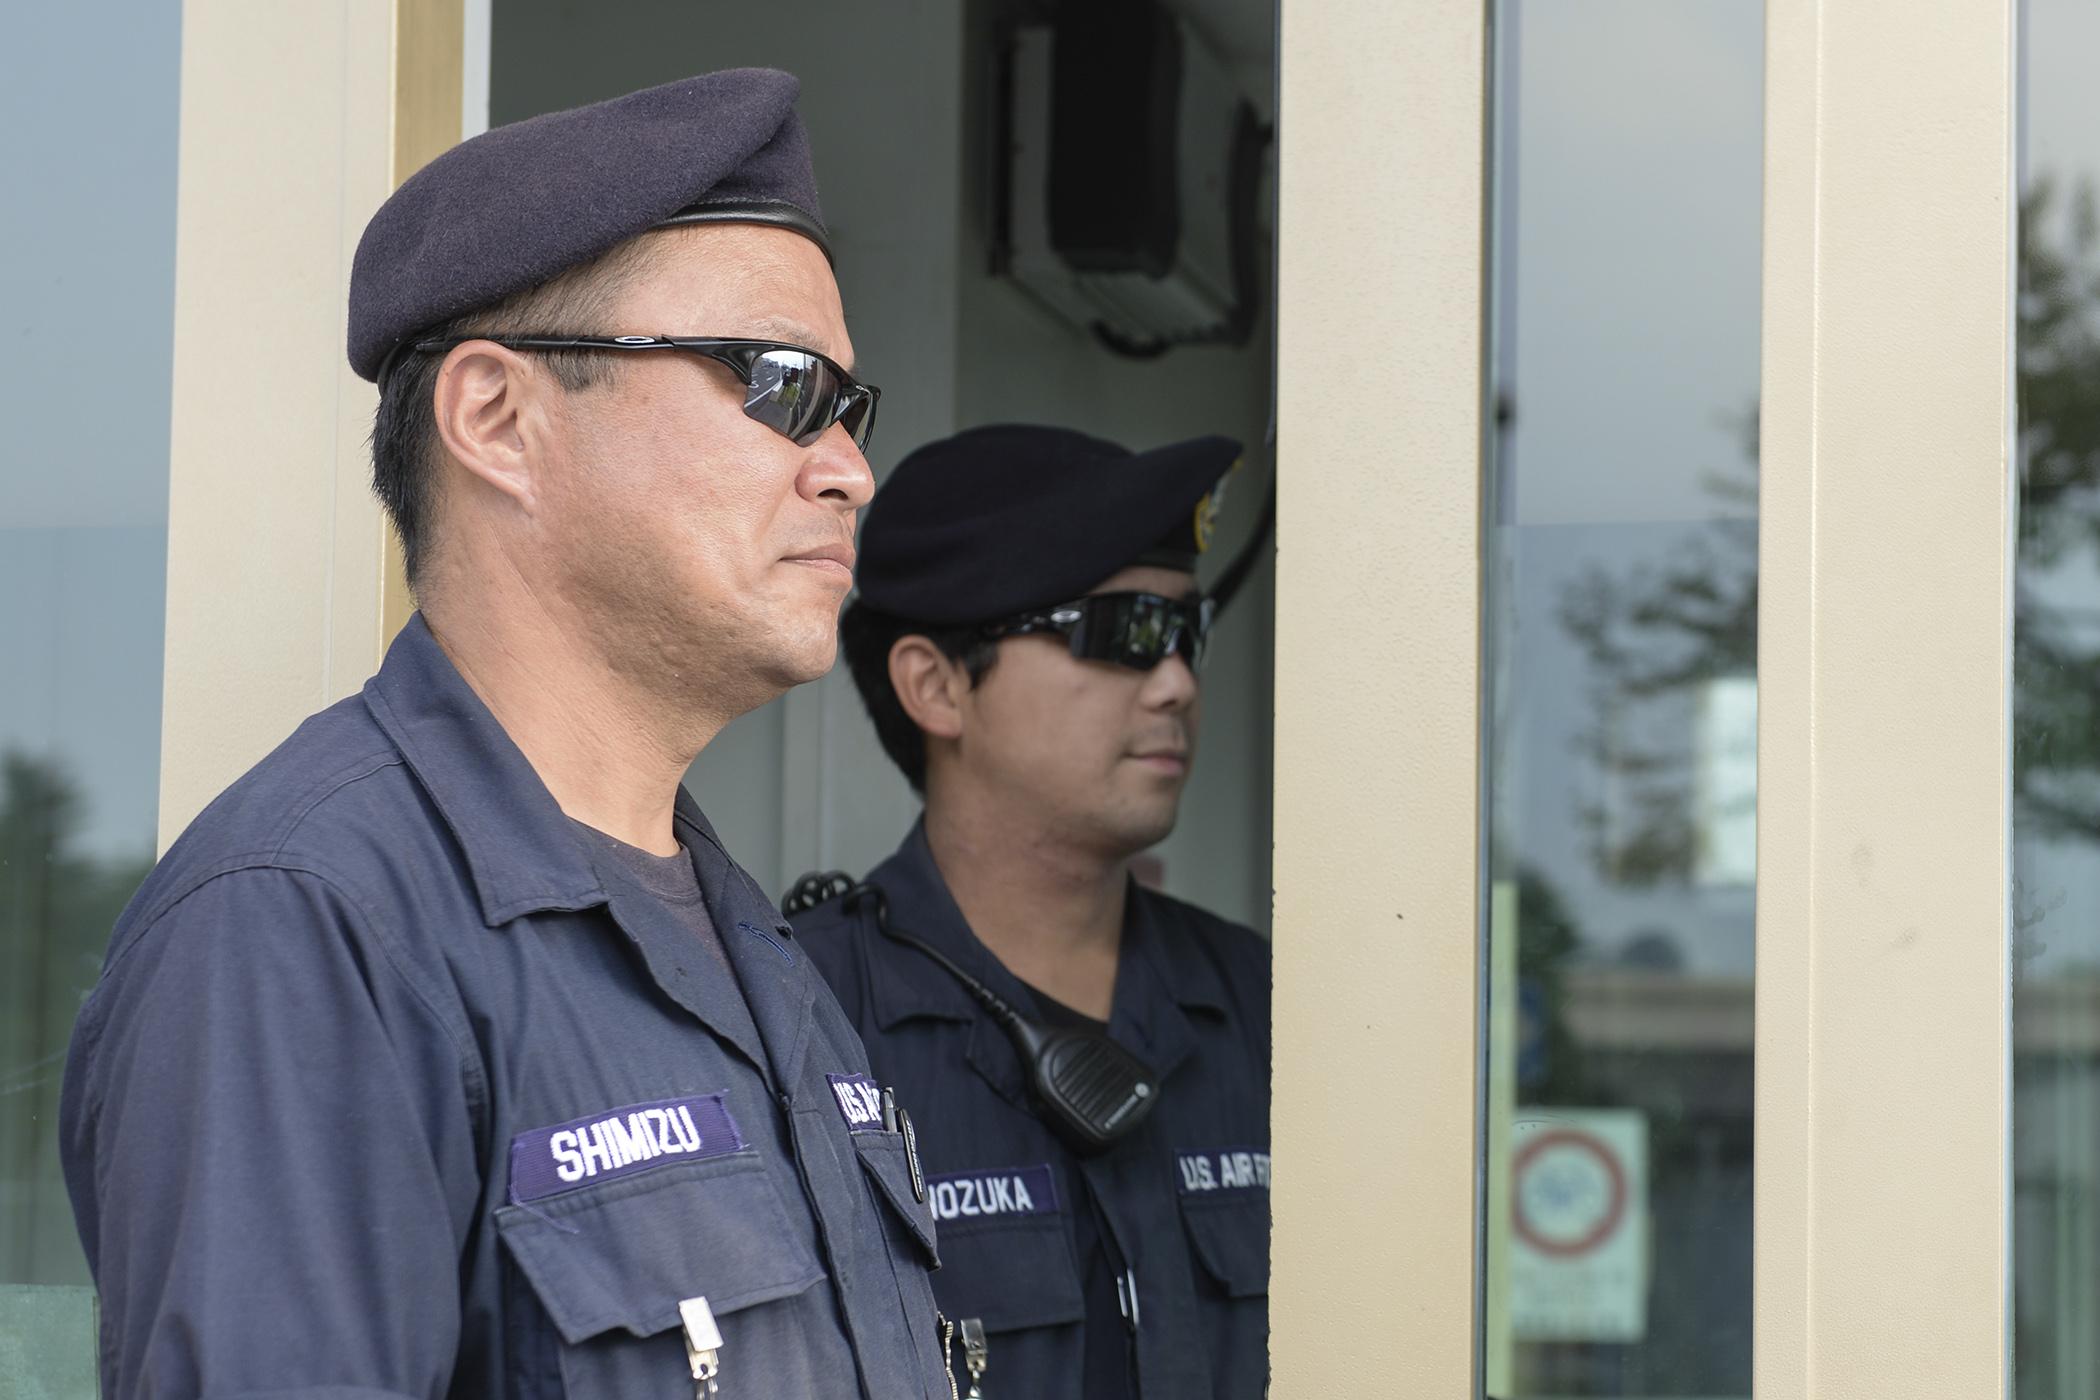 yokota guys Pmoc yokota 29 likes welcome to the official yokota air base protestant men of the chapel (pmoc) facebook page.